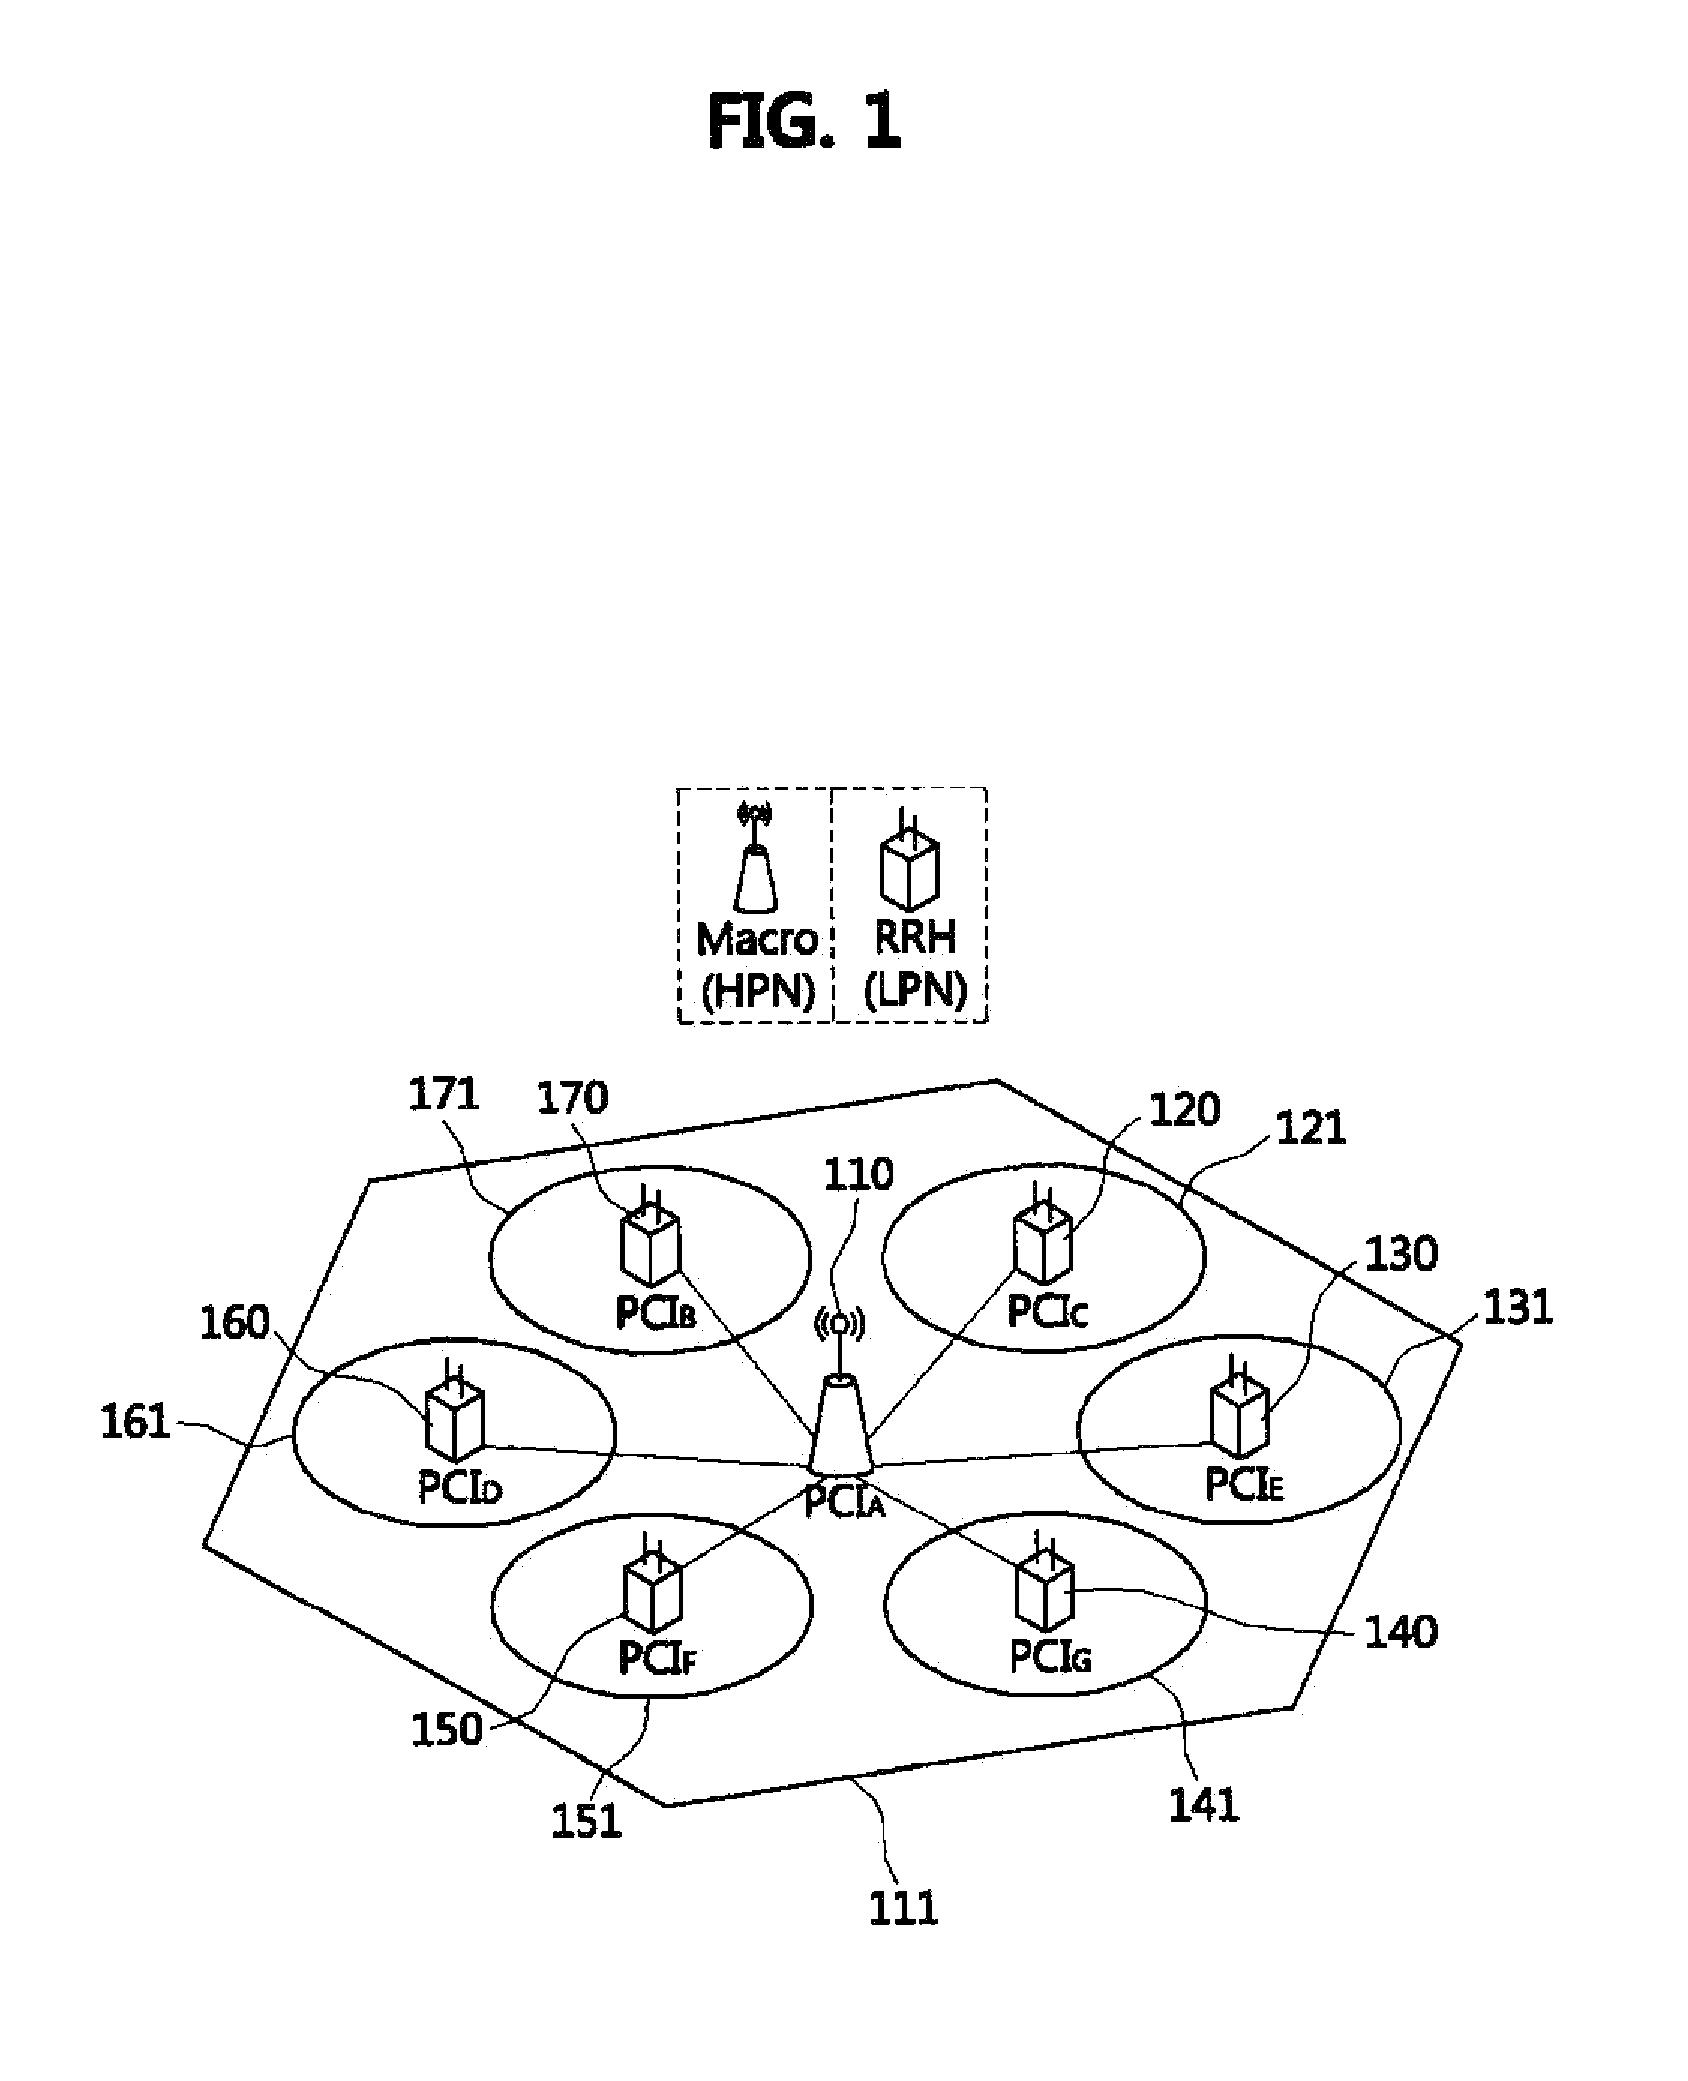 28 Aon Network Diagram Creator Gpmfirstfigure Network